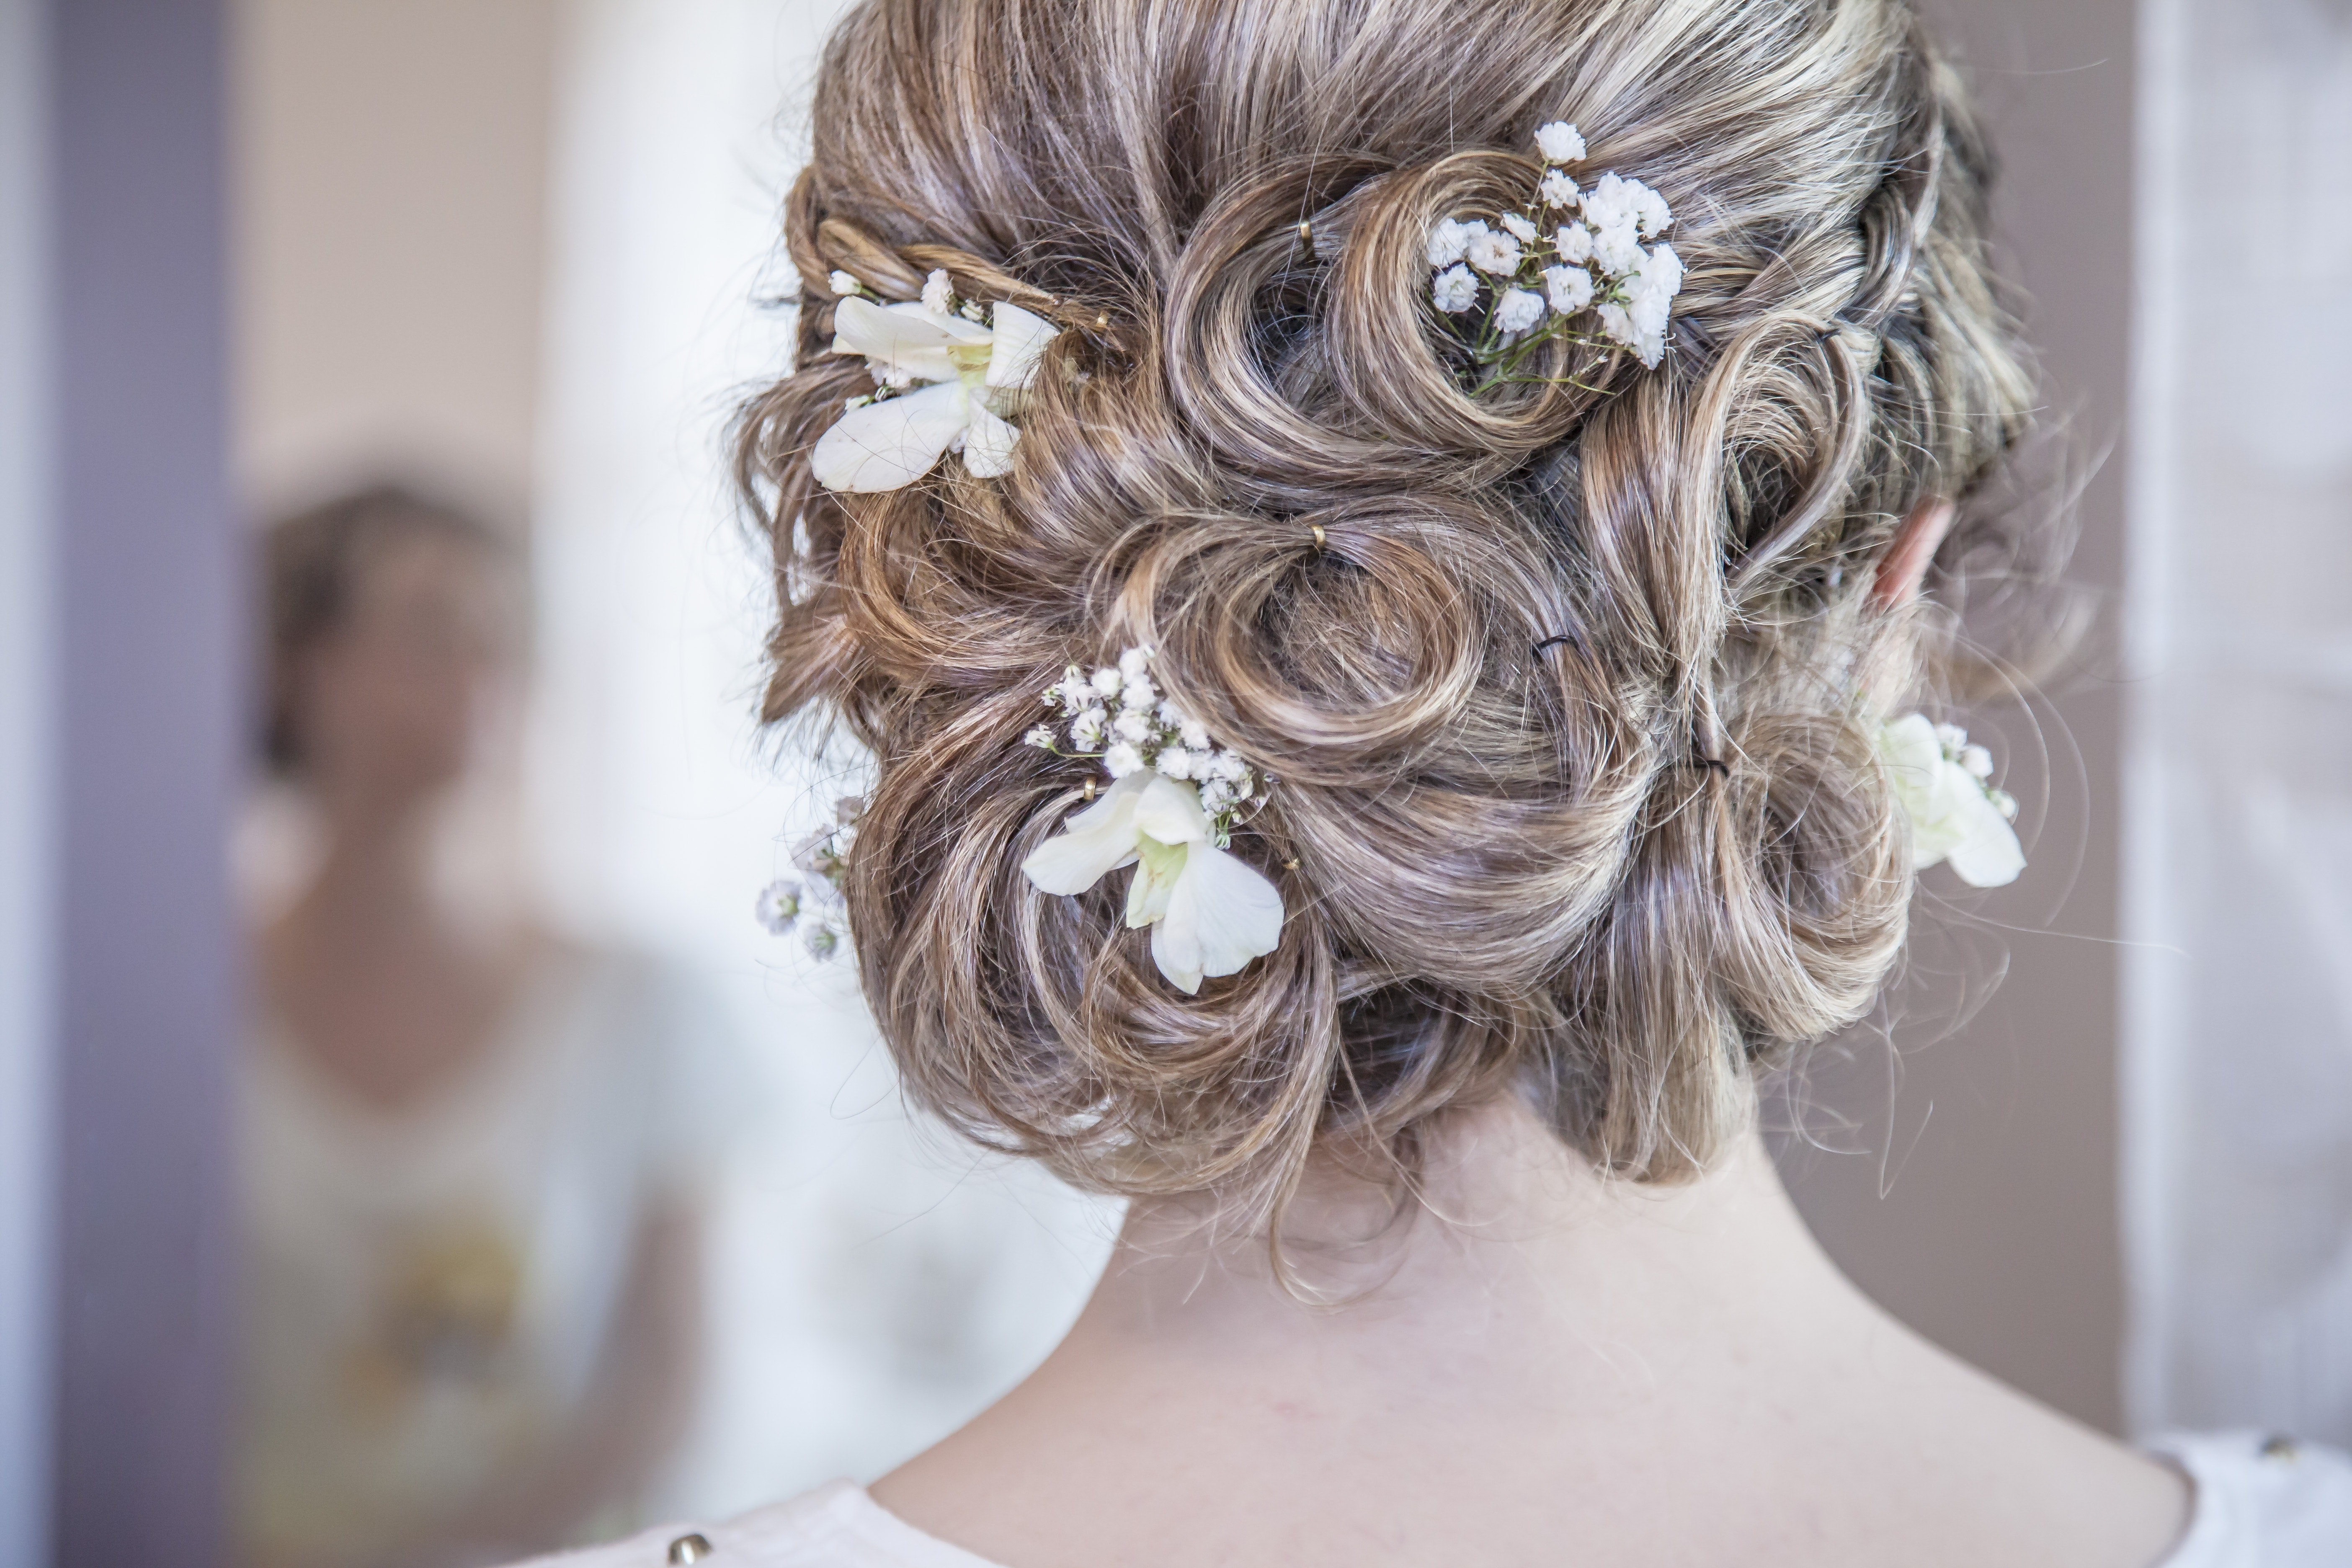 1000 Beautiful Hair Style Photos Pexels Free Stock Photos